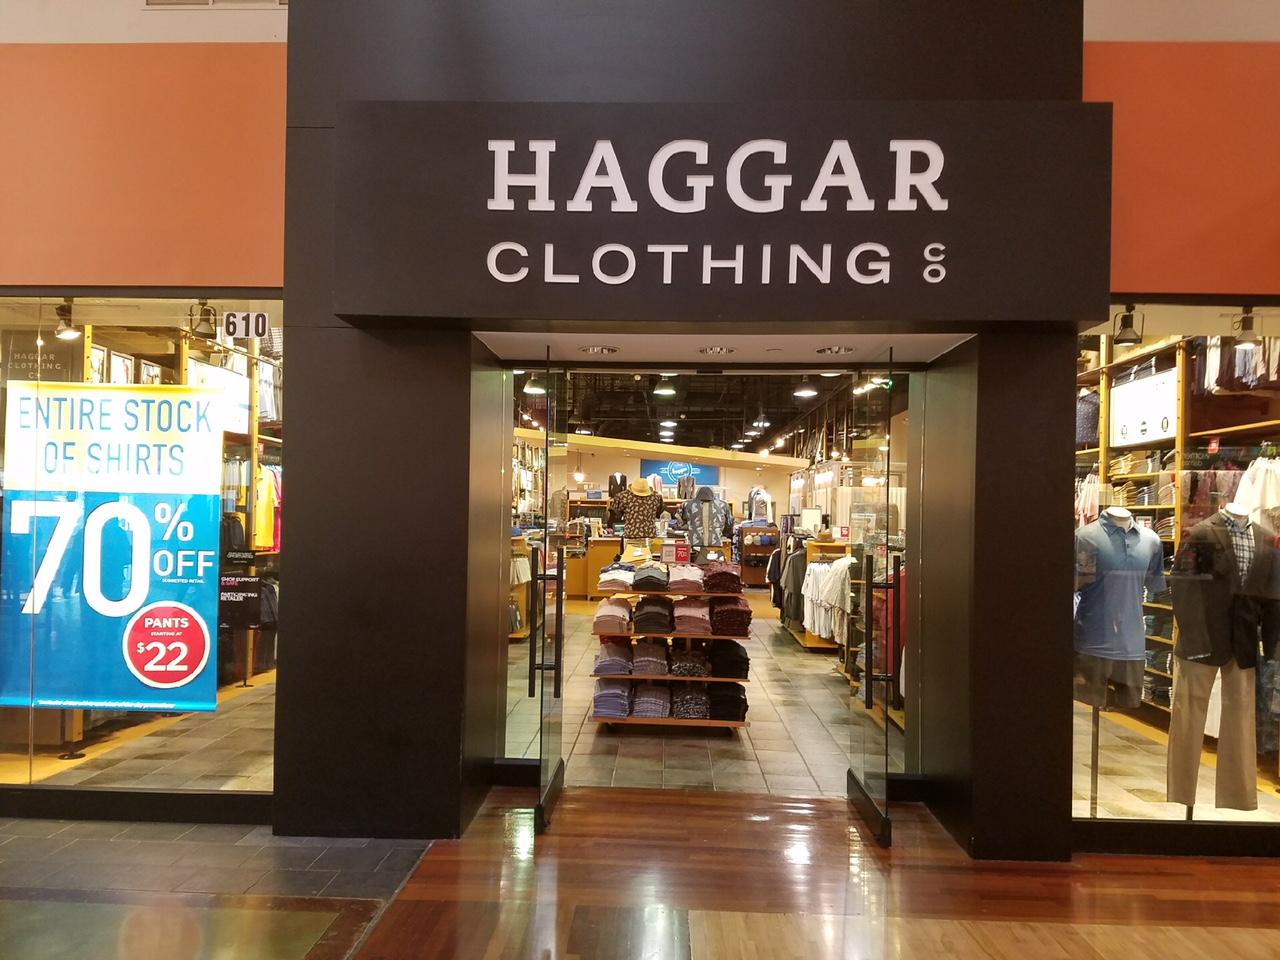 Haggar Clothing Co. image 0